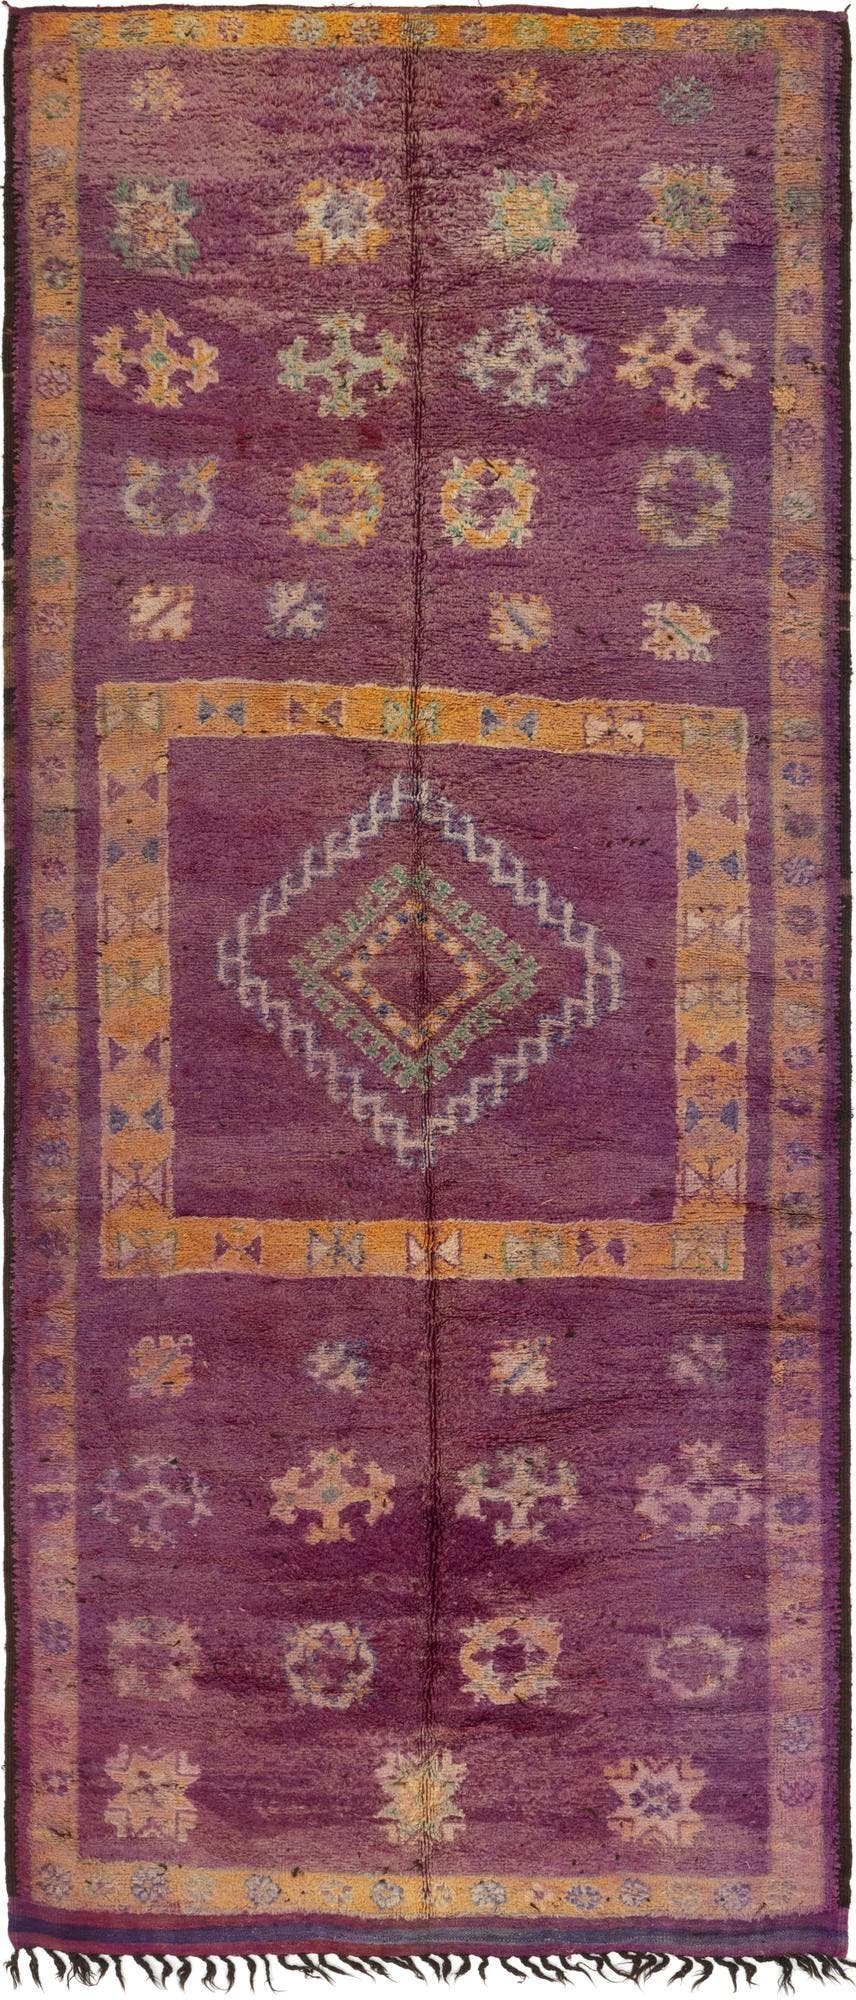 6' 6 x 15' 9 Moroccan Runner Rug main image